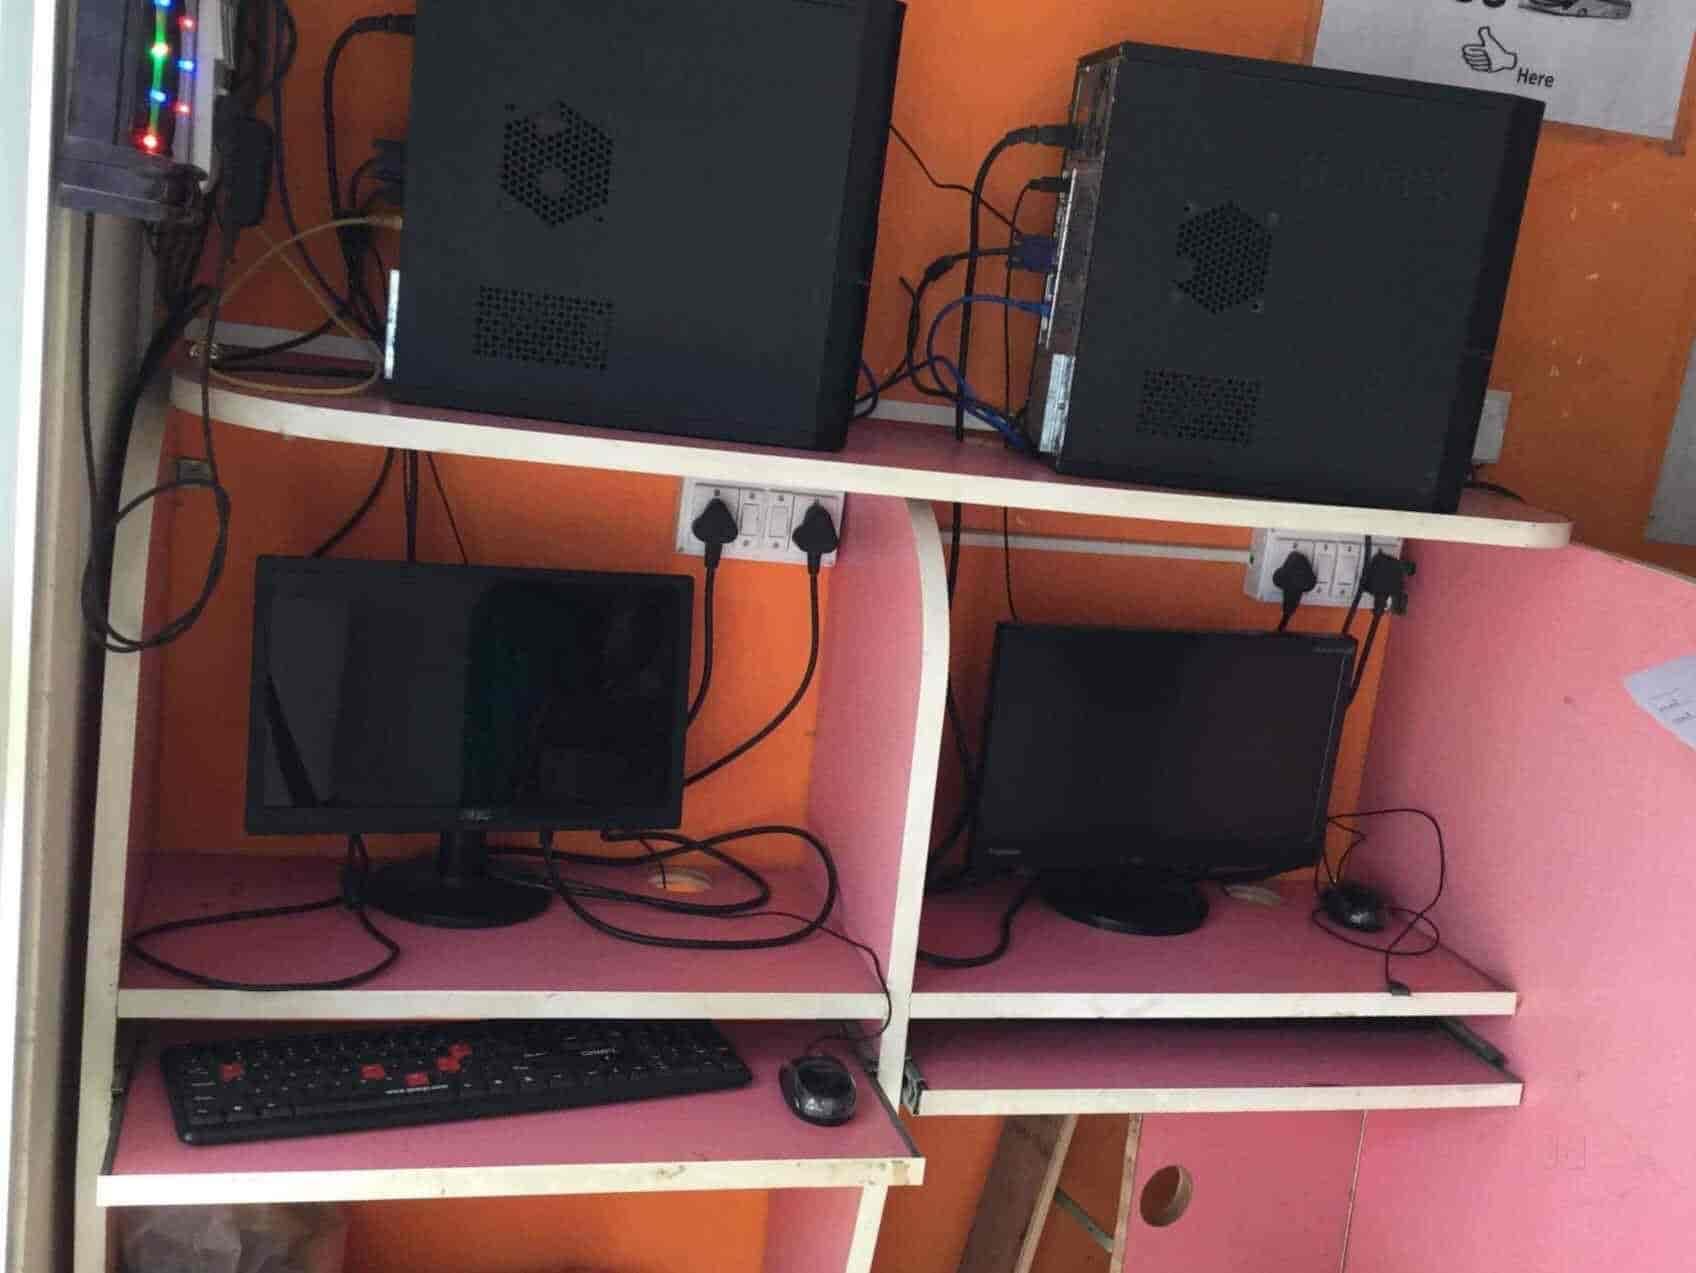 B N Online Services, Suchitra Cross Road - Money Transfer ... Online Money Wiring on